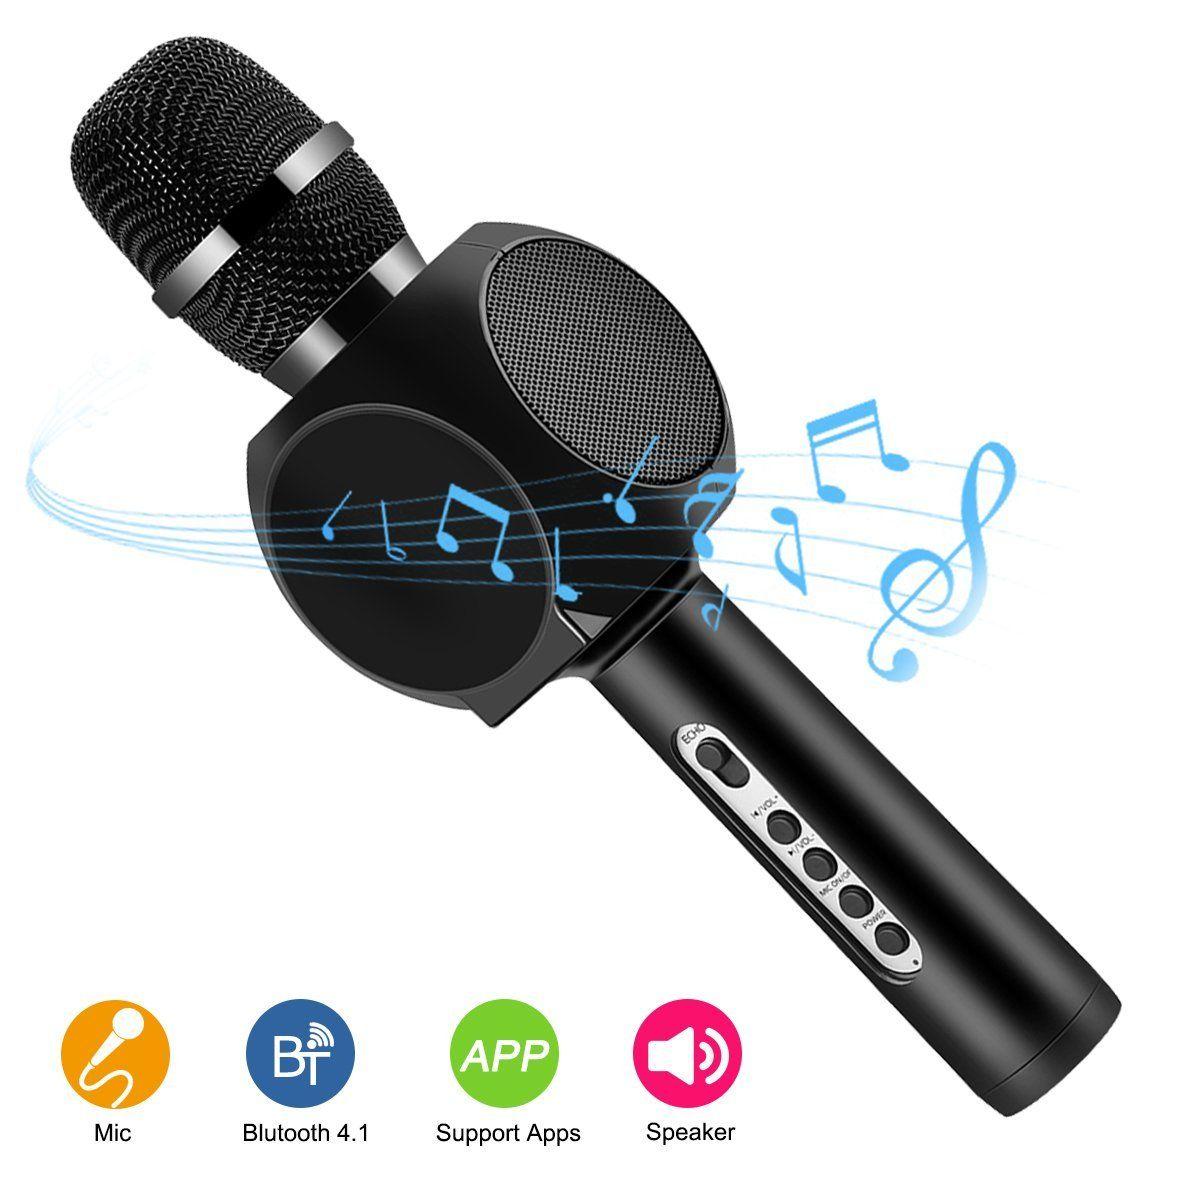 Altavoz con microfono-amazon ofertas